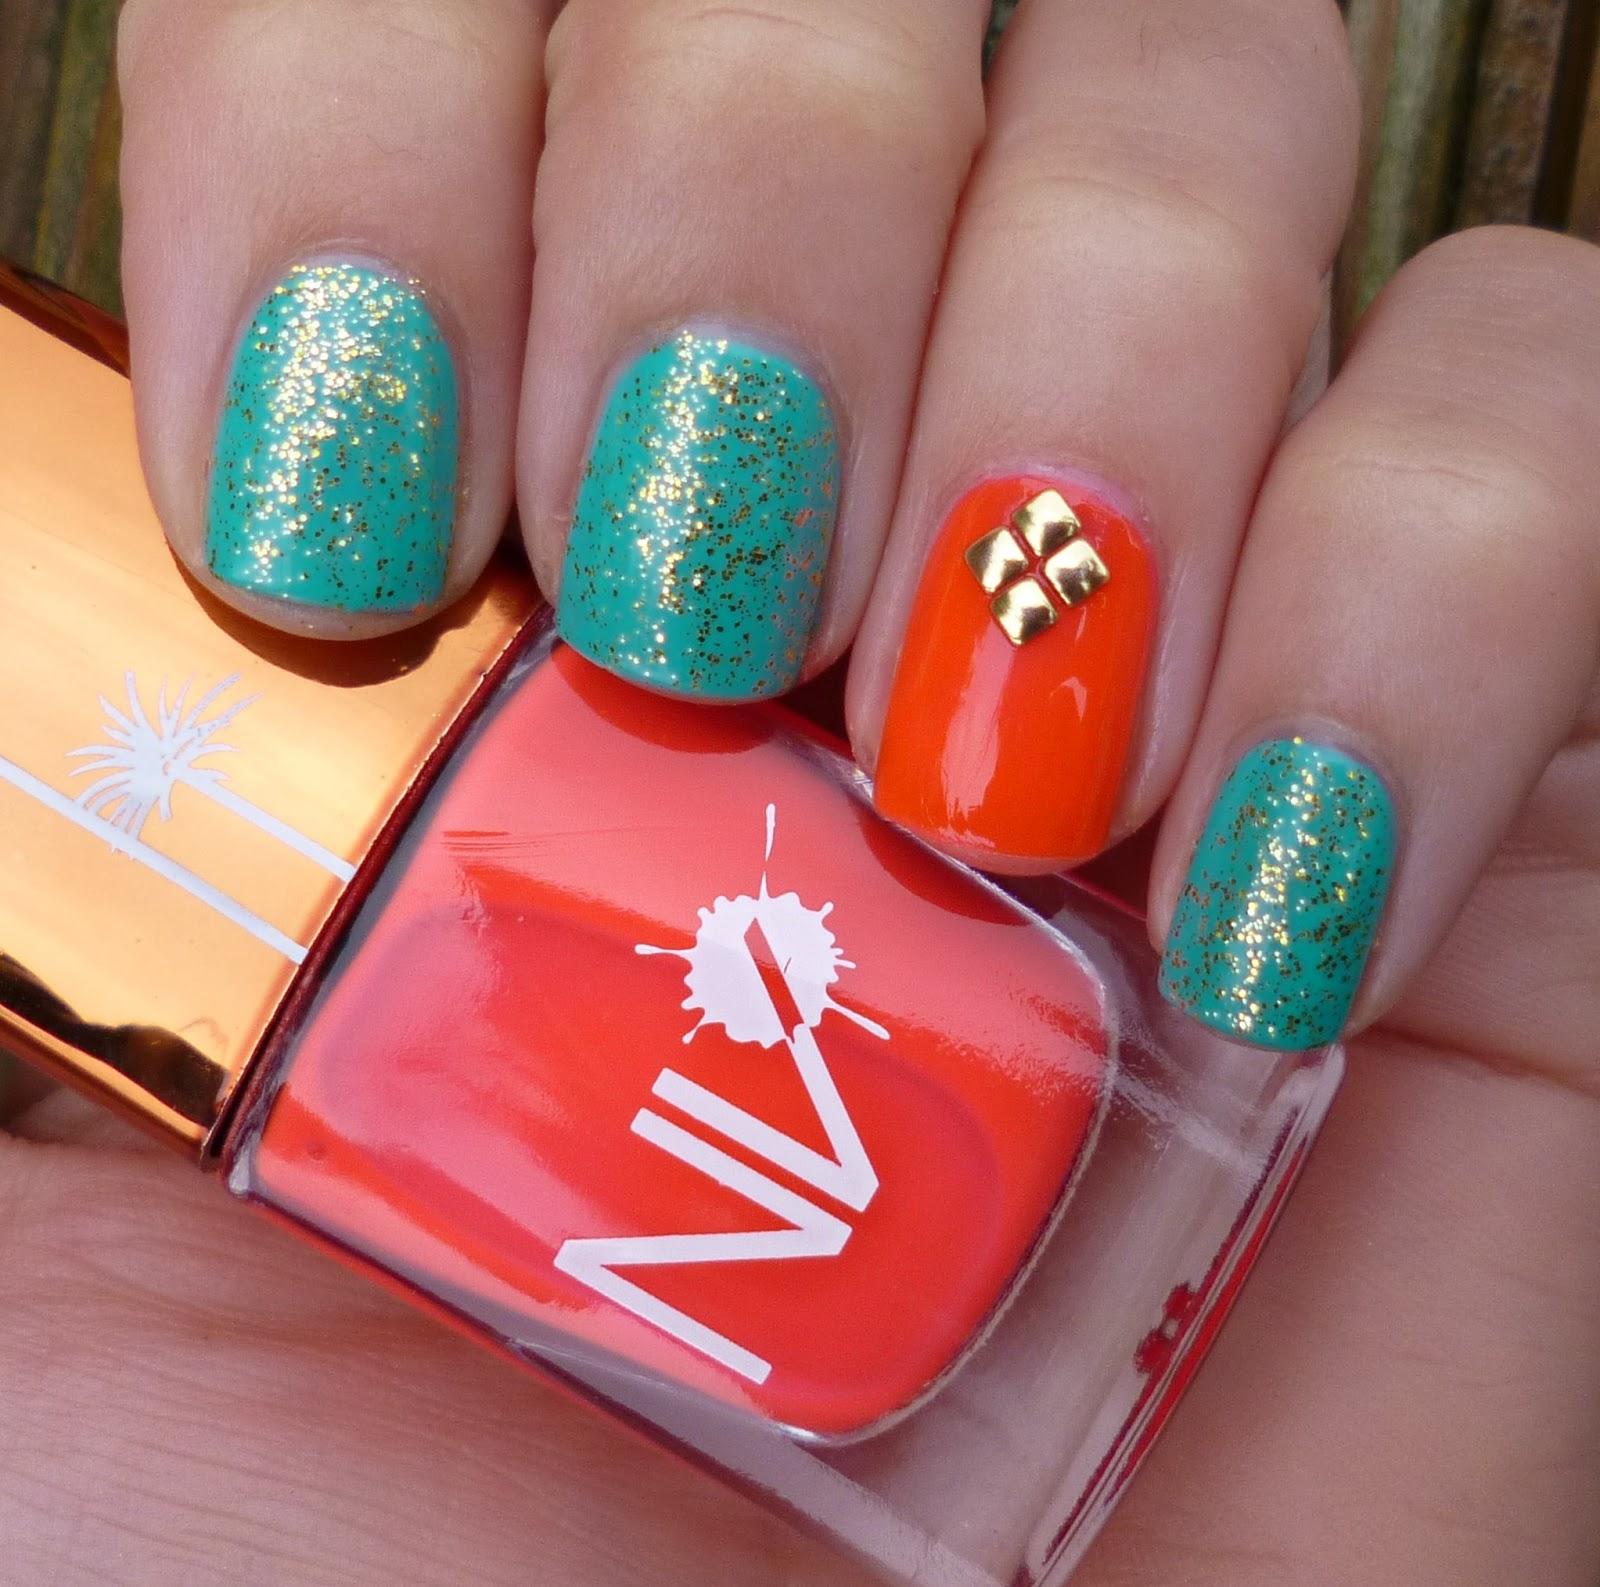 Lou Is Perfectly Polished Christmas Nails Christmas Trees: Lou Is Perfectly Polished: Turquoise And Orange: Same